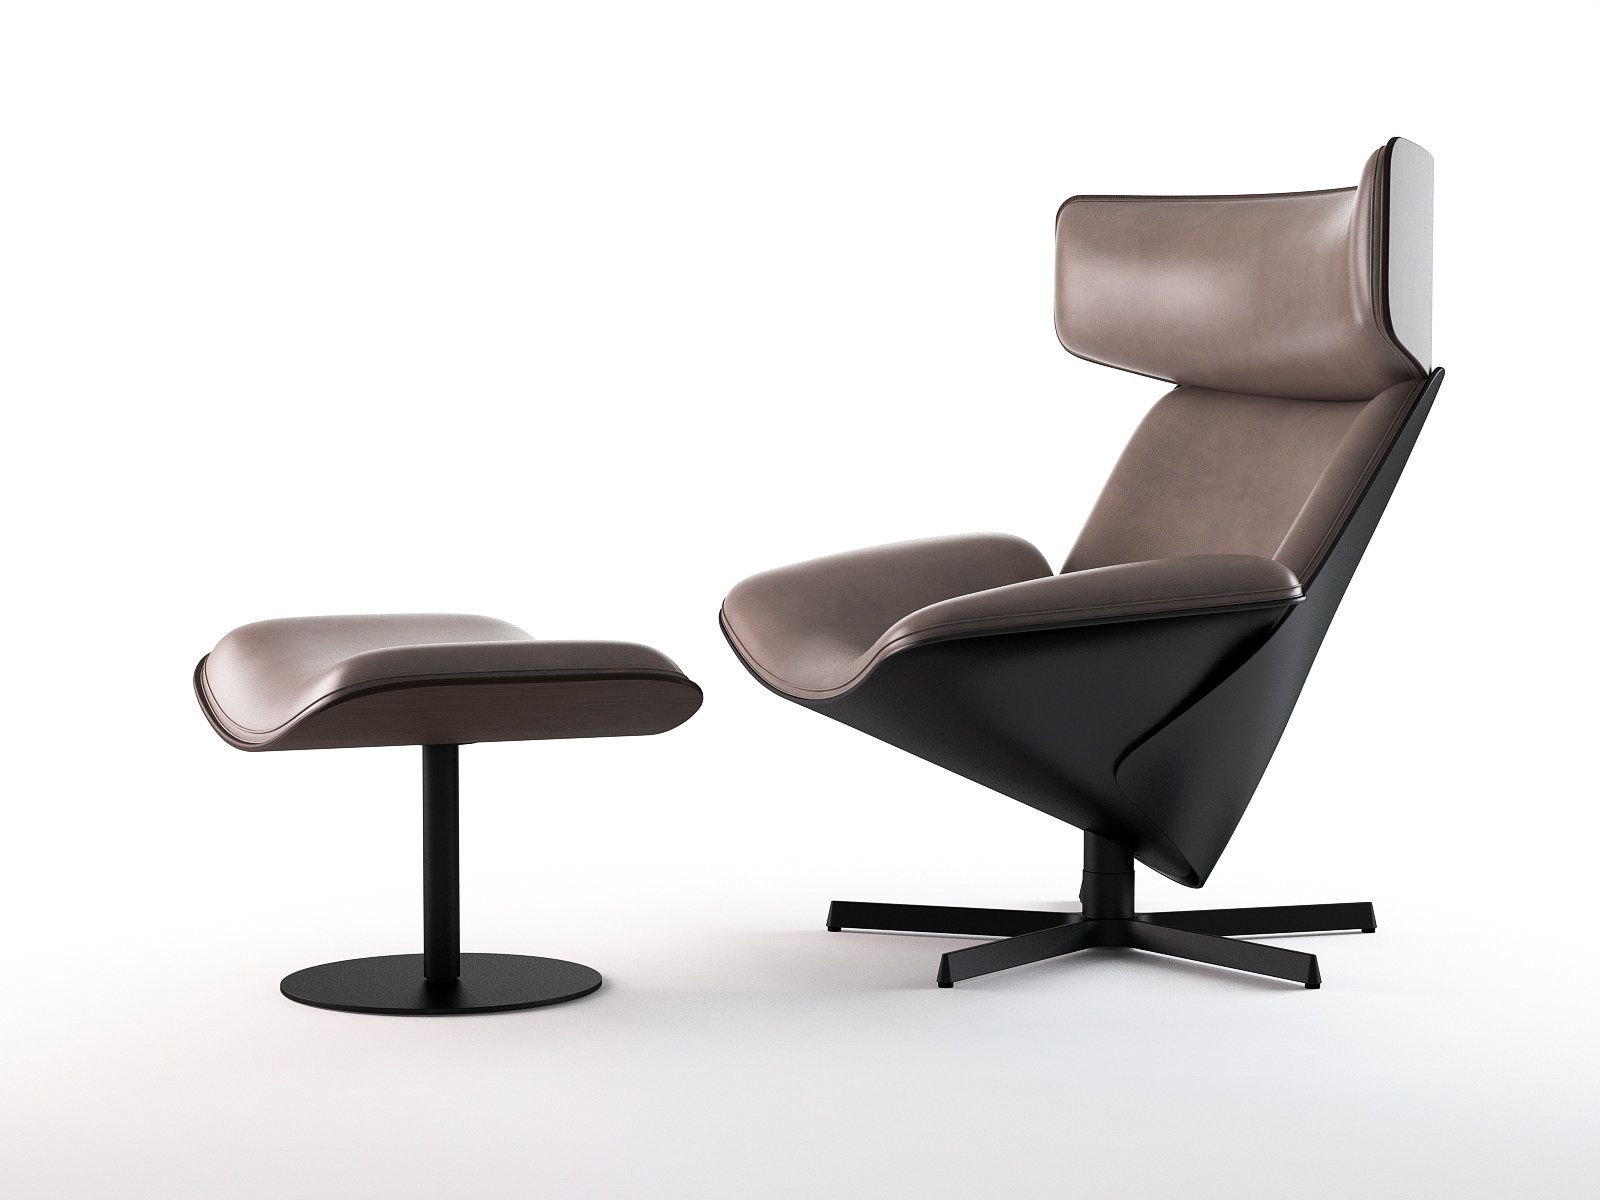 Armchair: ALMORA   Collection: Bu0026B Italia   Design: Doshi Levien    Furniture Design   Pinterest   Armchairs, Italia And Collection